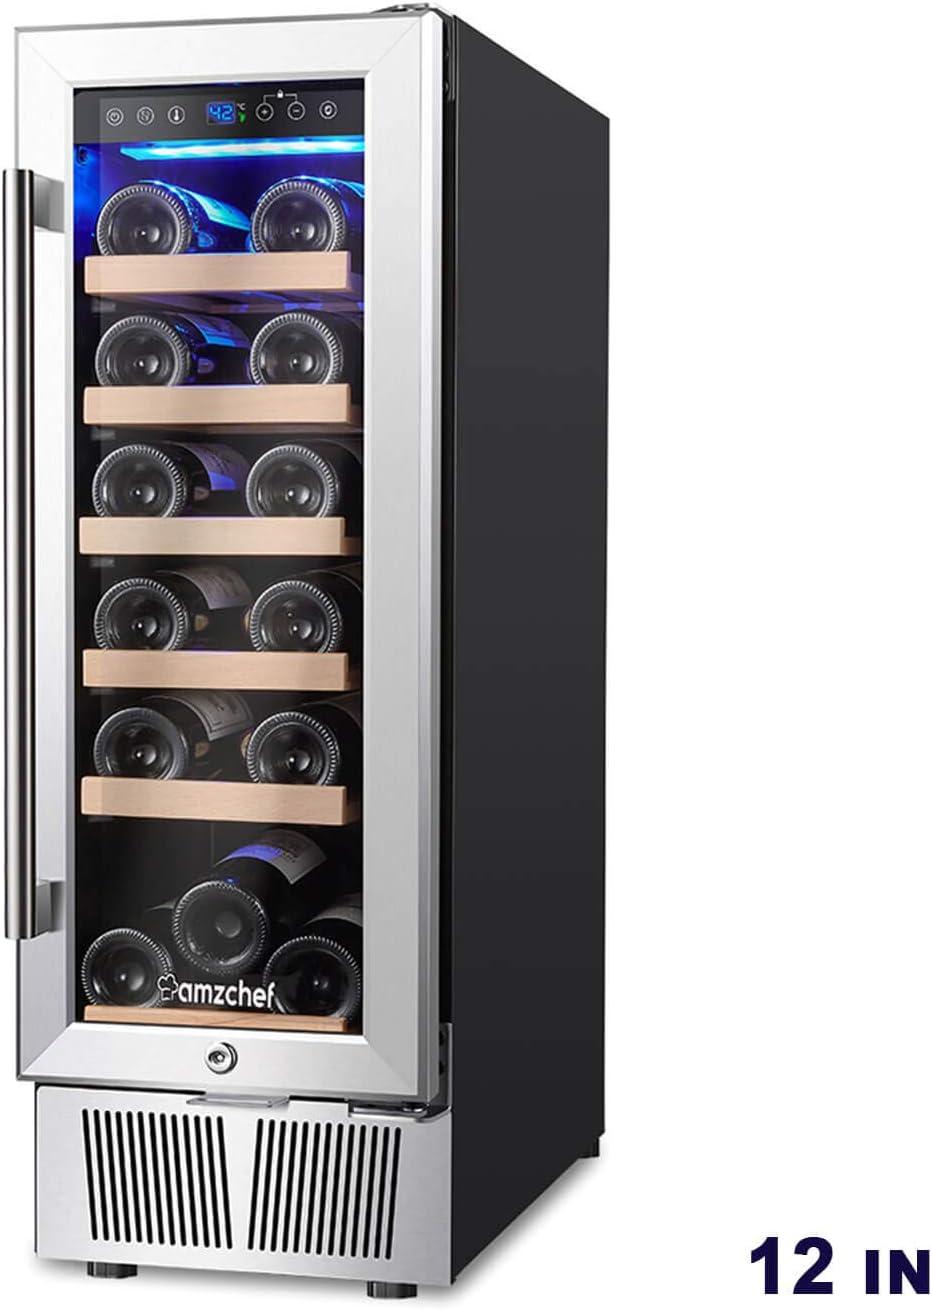 AMZCHEF 12 Wine Cooler, Wine Refrigerator Built-in or freestanding Quiet Constant Temperature